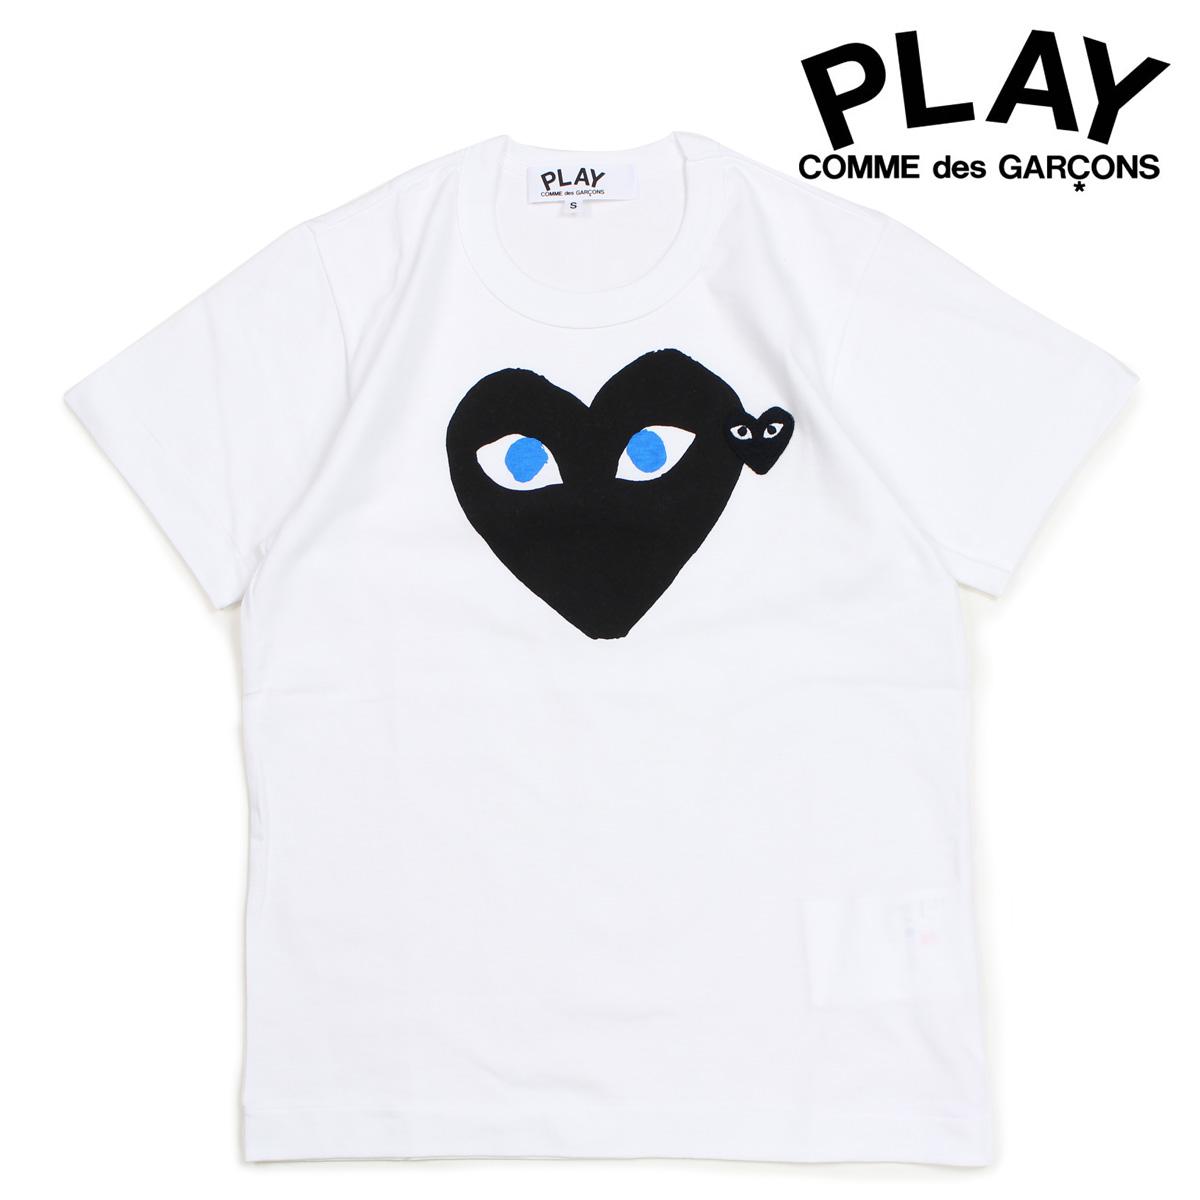 PLAY COMME des GARCONS BLACK HEART T-SHIRT コムデギャルソン Tシャツ 半袖 レディース ホワイト AZT087